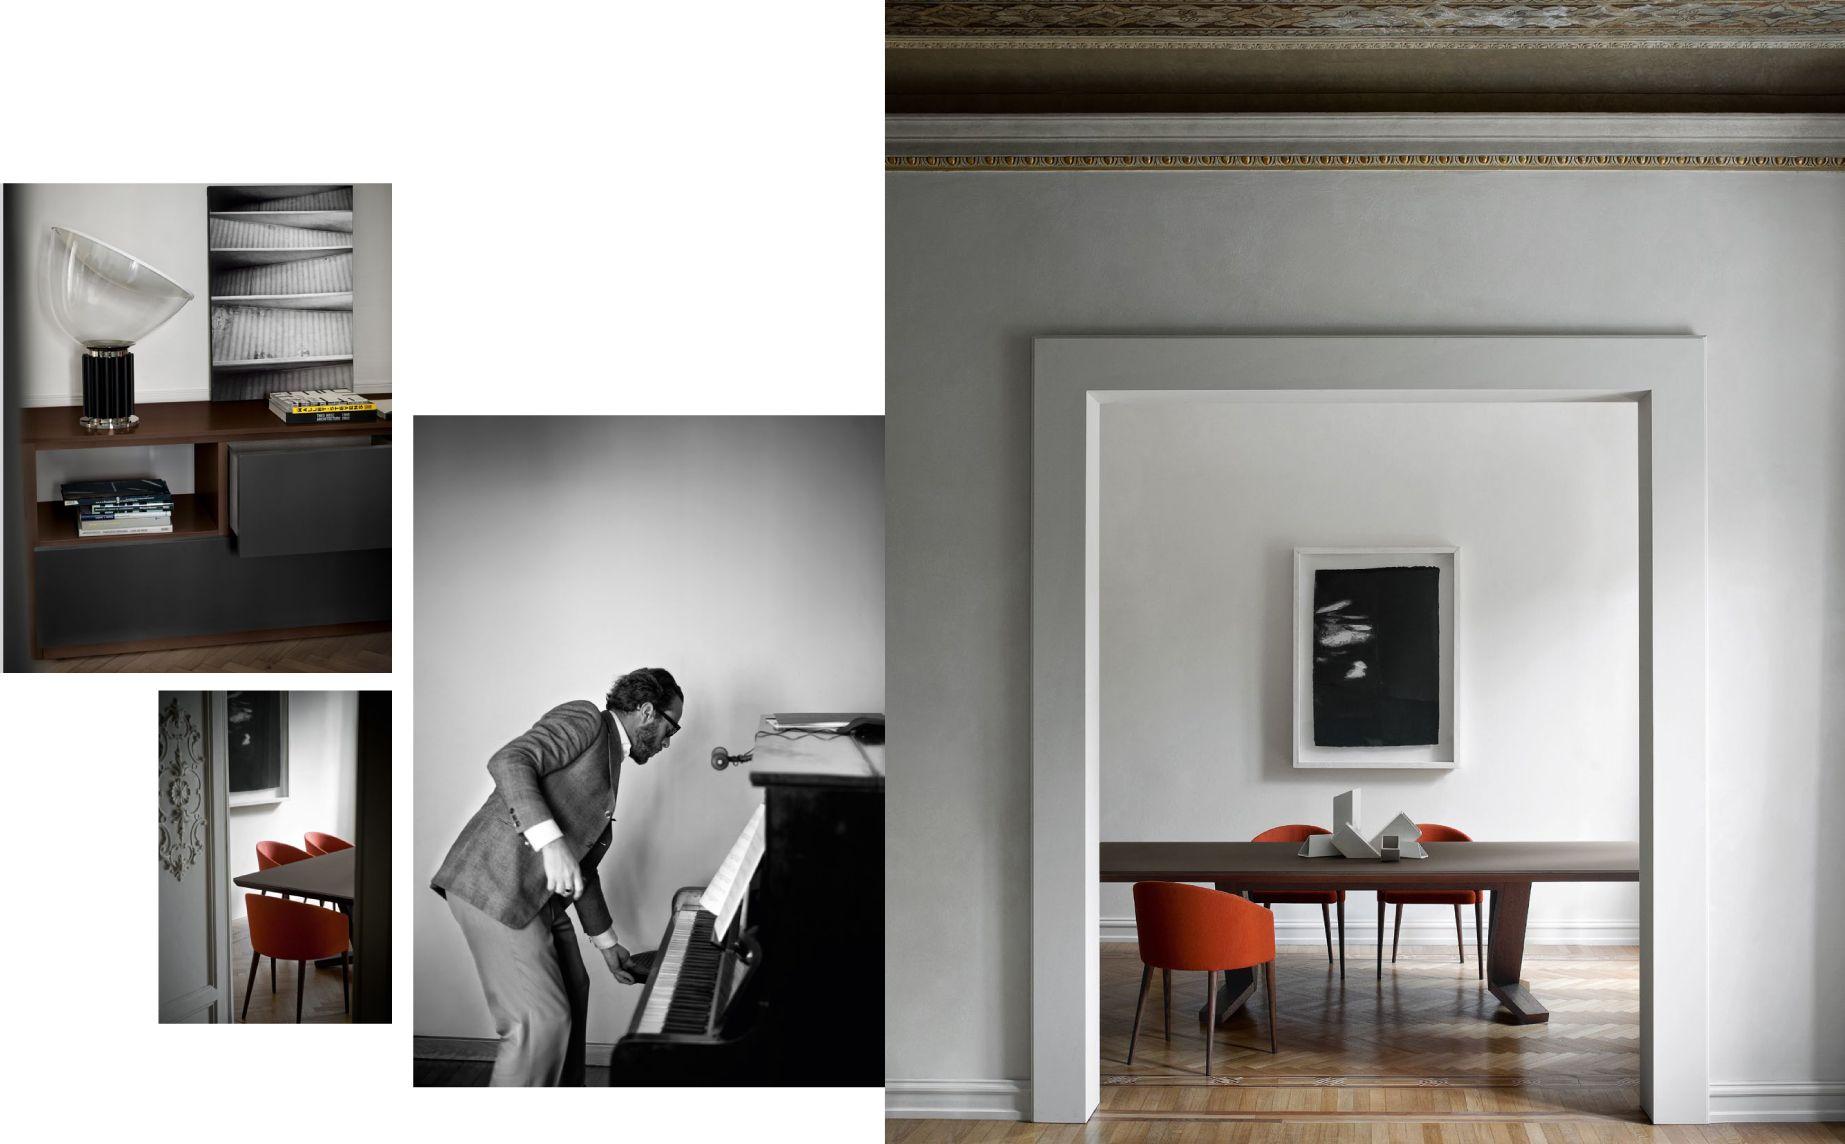 Jesse mobili ~ Jesse mobili arredamento design wall units open view